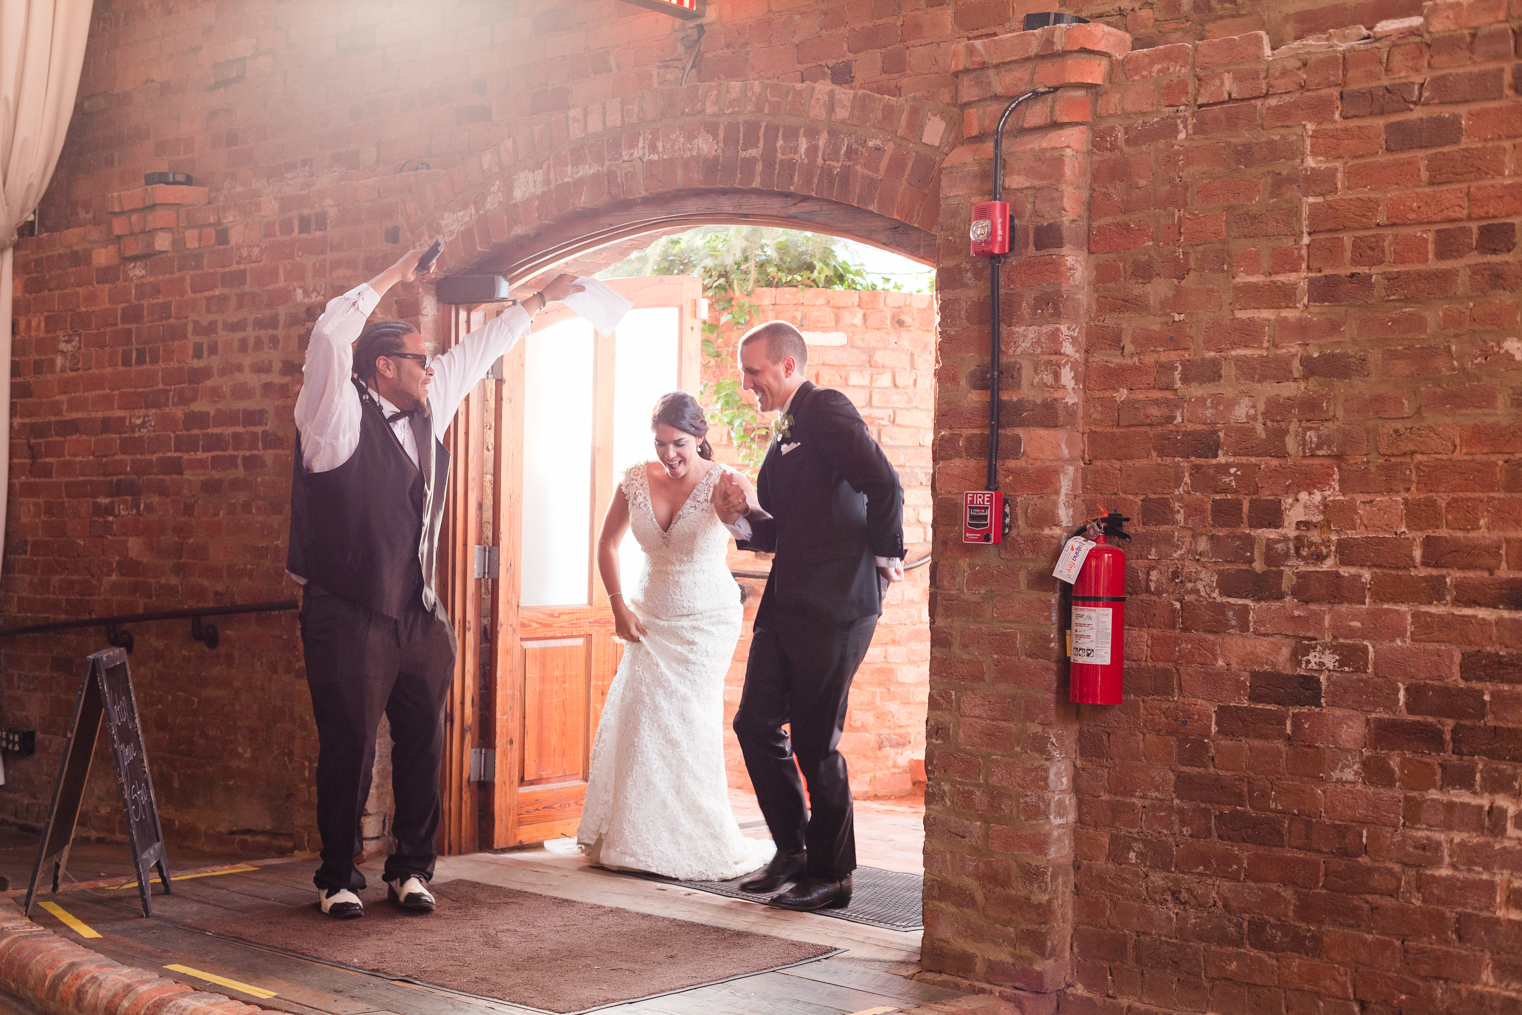 170527-MM-Old-Cigar-Warehouse-Wedding-541.jpg